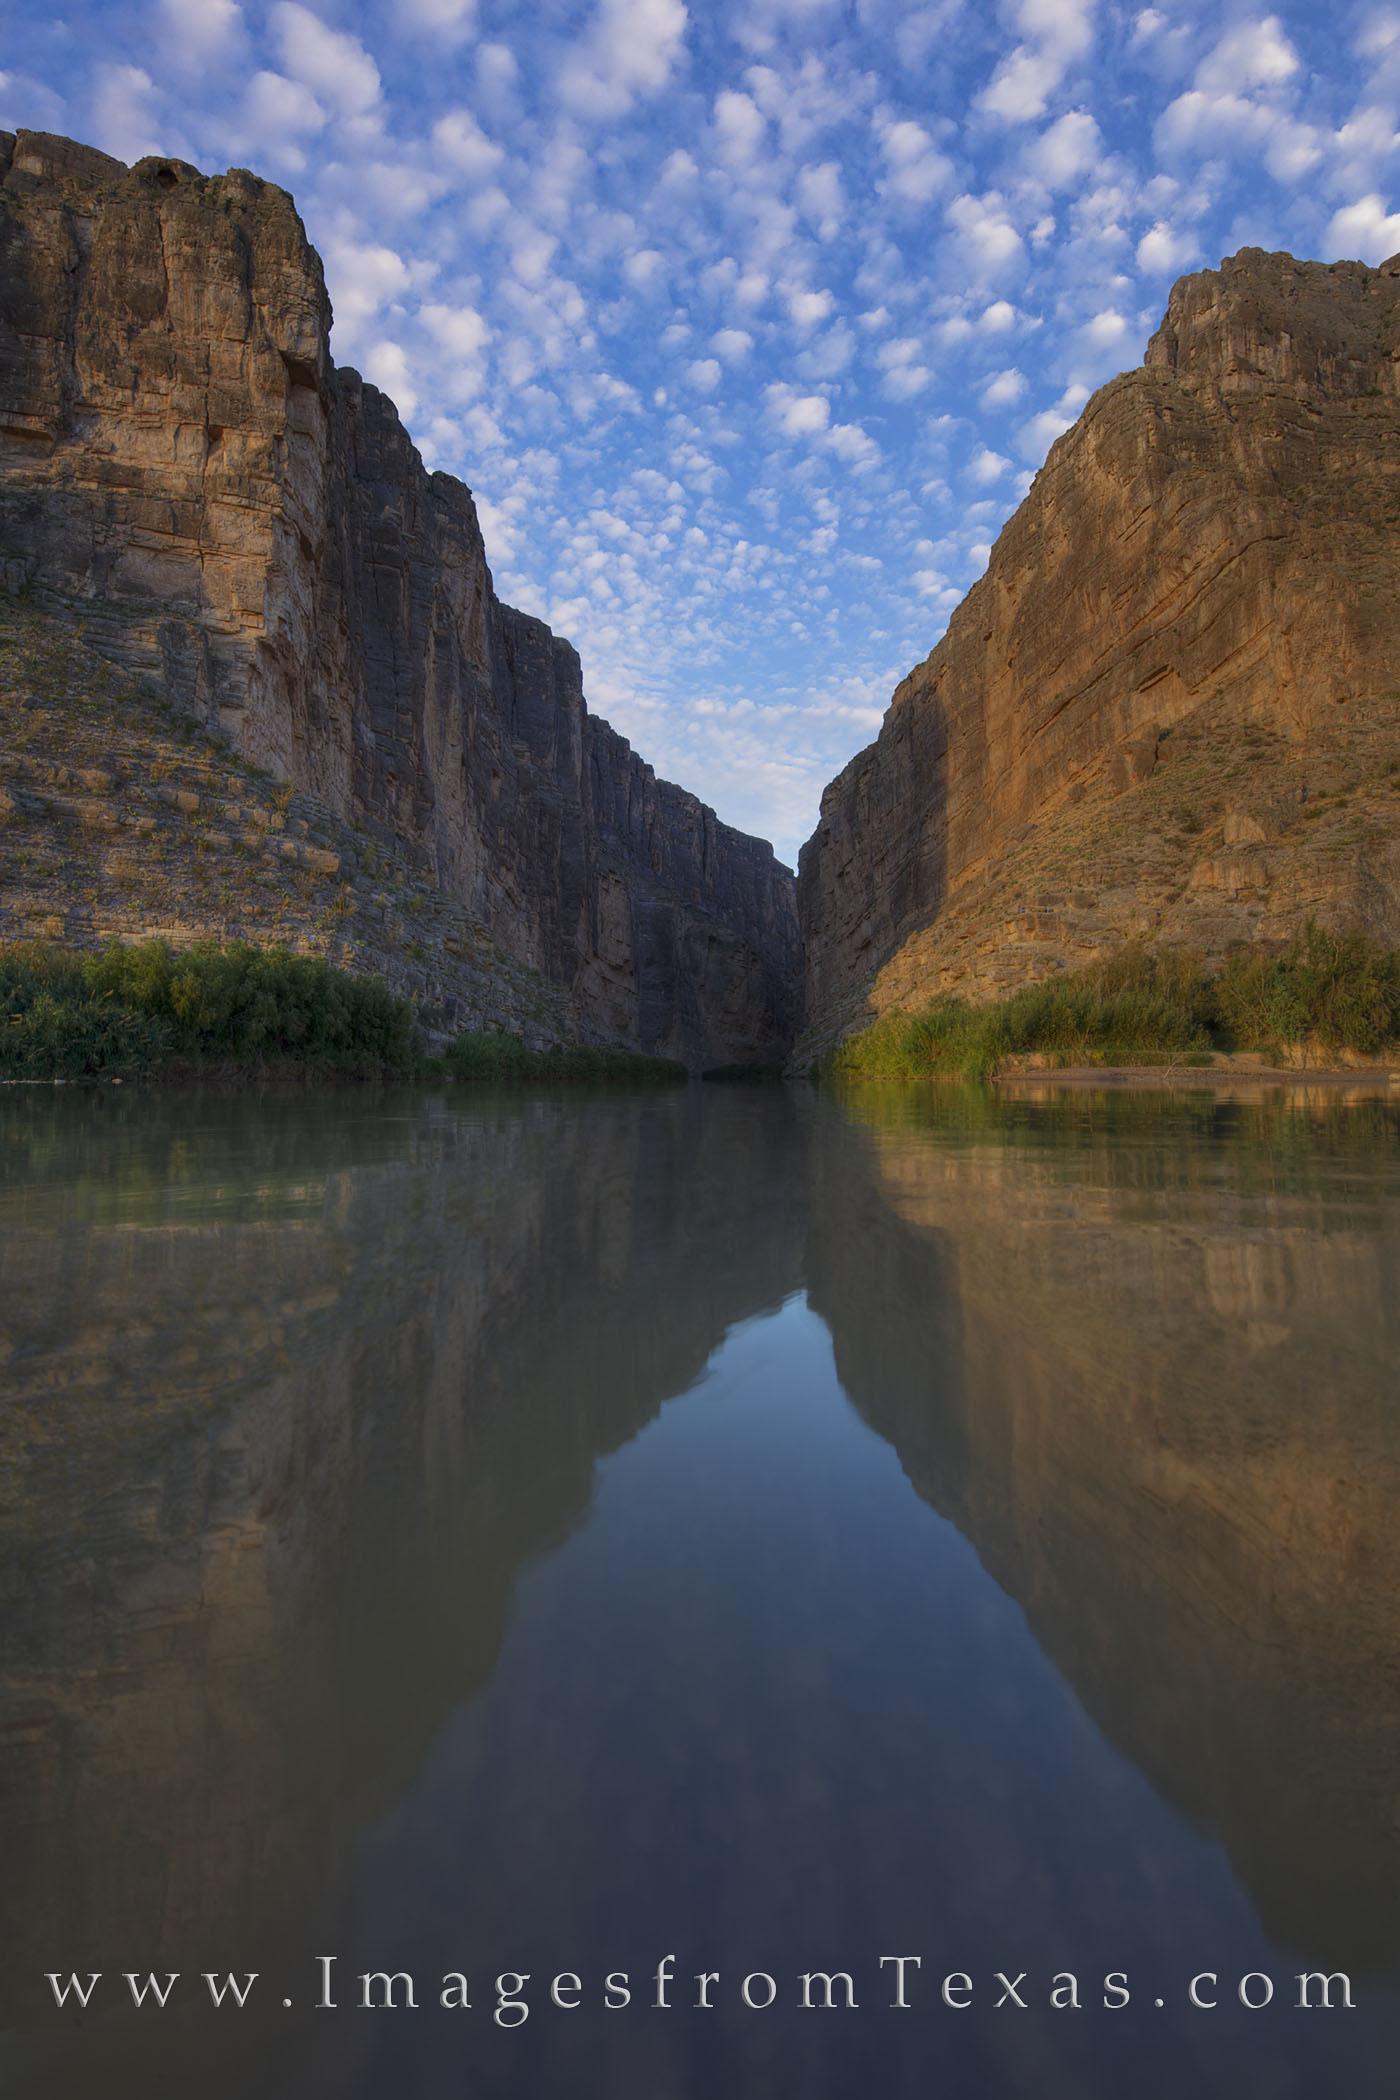 big bend national park, santa elena canyon, big bend images, texas national parks, texas canyons, morning, canyons, sunrise, rio grande, river, texas rivers, texas landscapes, photo